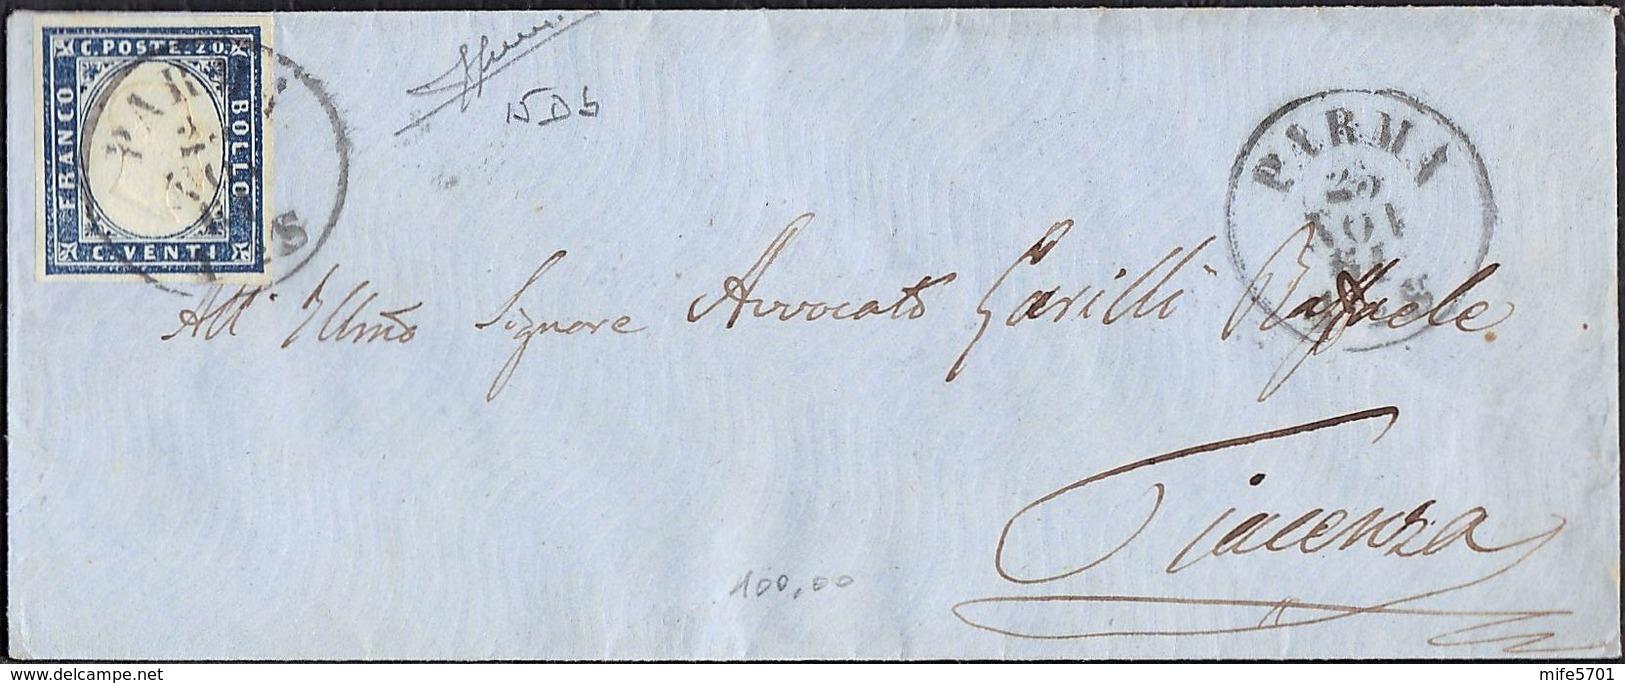 SARDEGNA FRANCOBOLLO C. 20 SU PICCOLA BUSTA DA PARMA PER PIACENZA DEL 25/11/1861 - SASSONE 15Db (CELESTE GRIGIASTRO) - Sardaigne